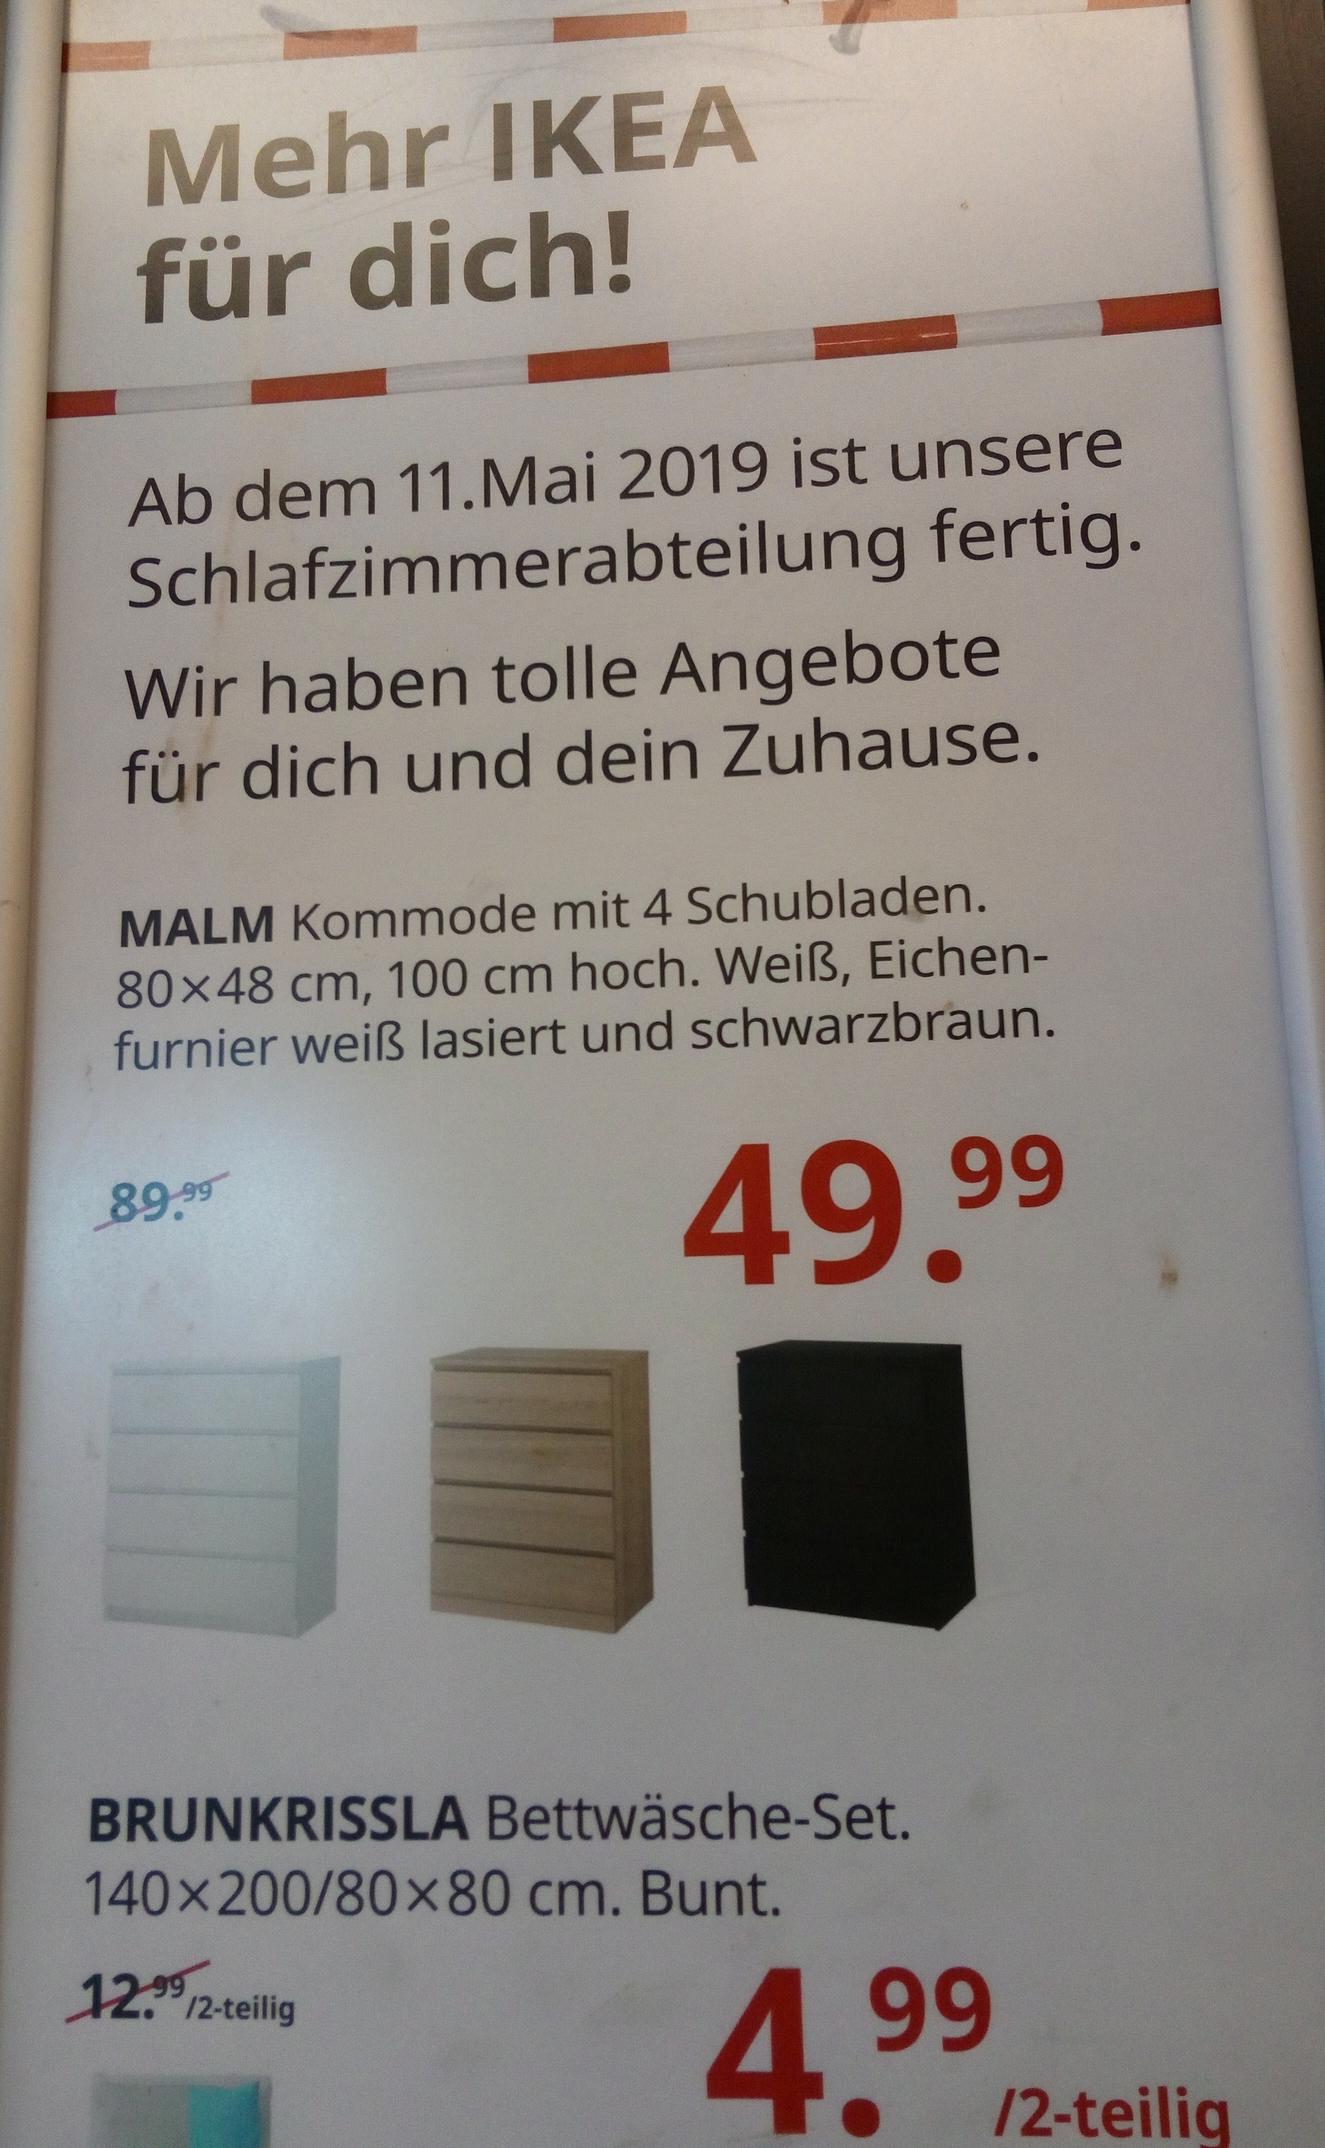 nur IKEA Berlin Spandau:   MALM Kommode 80x48, 100cm hoch mit fast 45% Rabatt für 50€ statt 90€